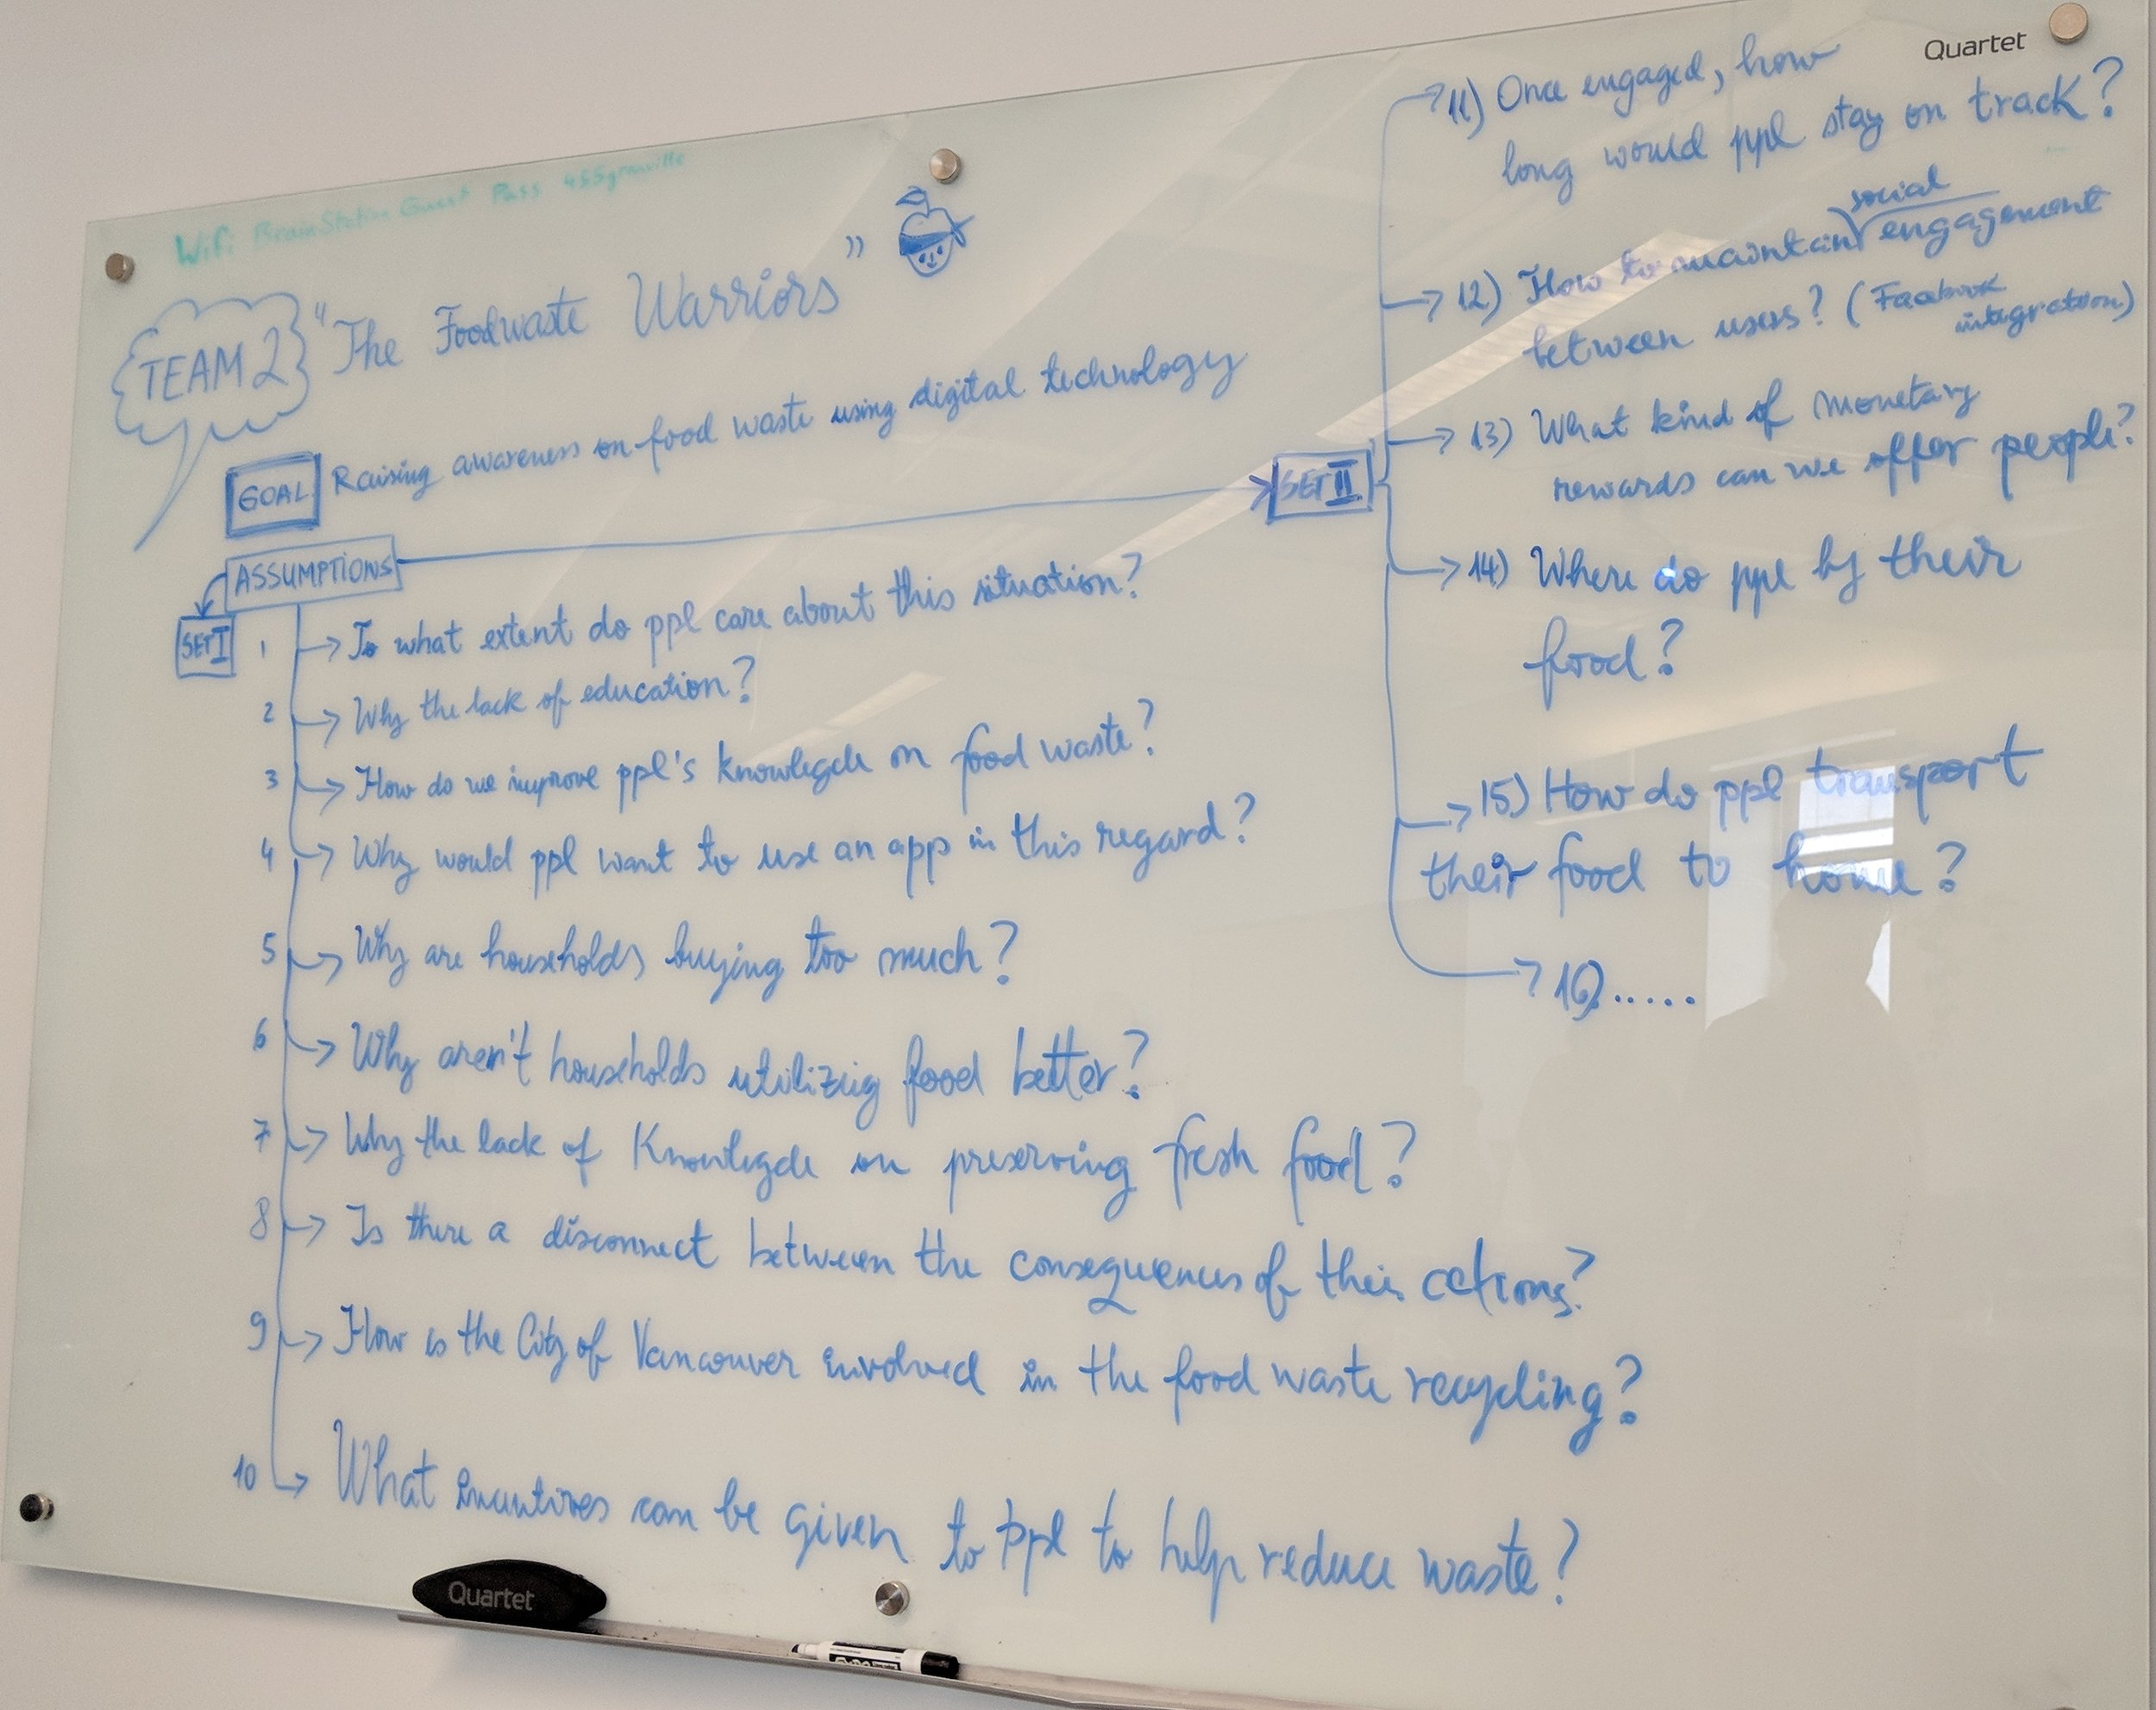 Deciding on a goal and highlighting assumptions.